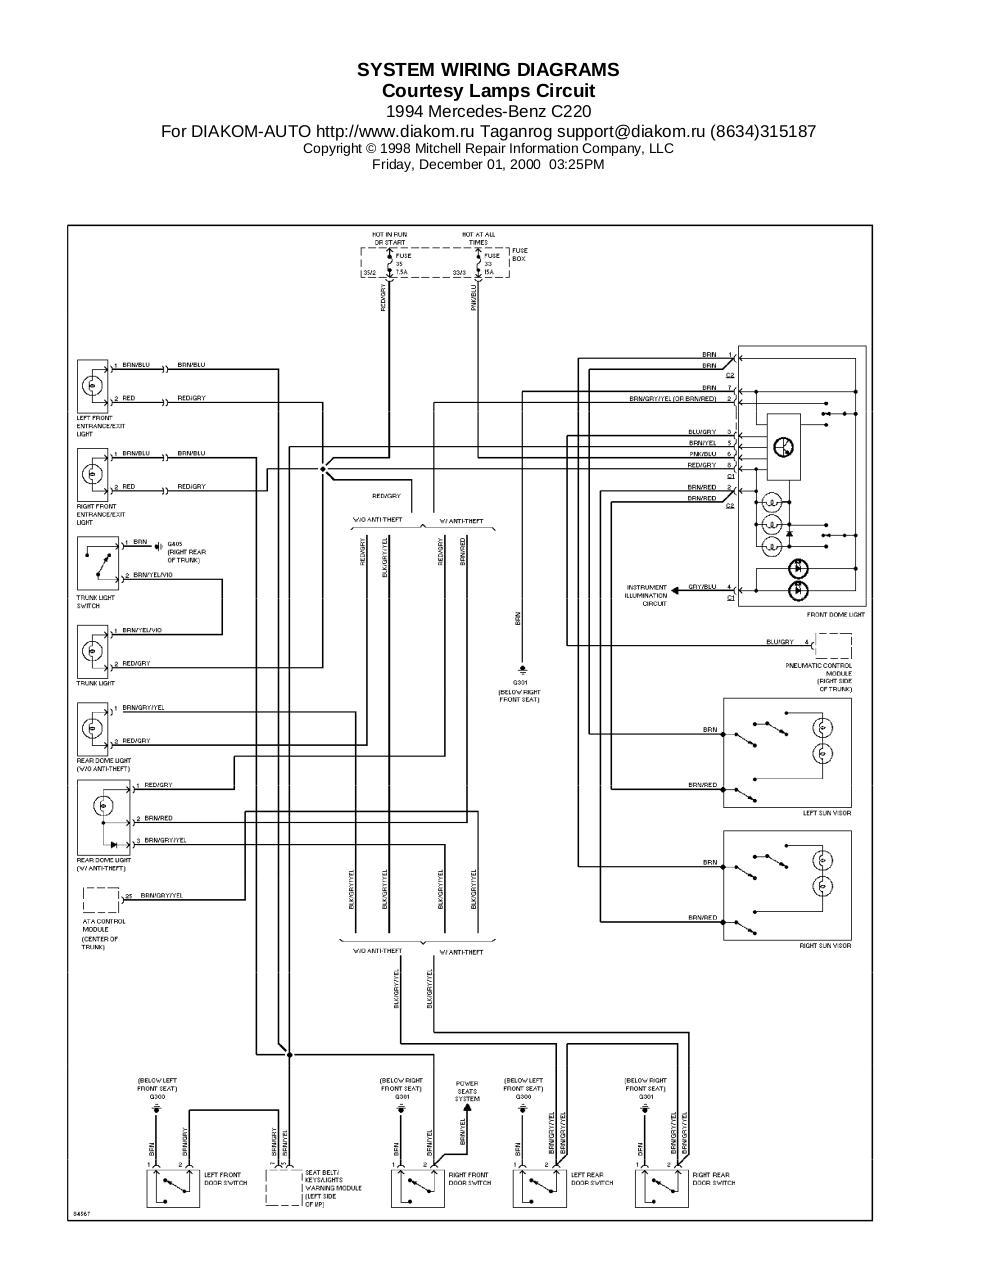 Recherche Pdf Ecu Bosch Me 745 Wiring Diagram For 207qecu 1995 Mercedes Benz C220 26 Lampe De Courtoisie System Diagrams Courtesy Lamps Circuit 1994 Diakom Auto Http Diakomru Taganrog